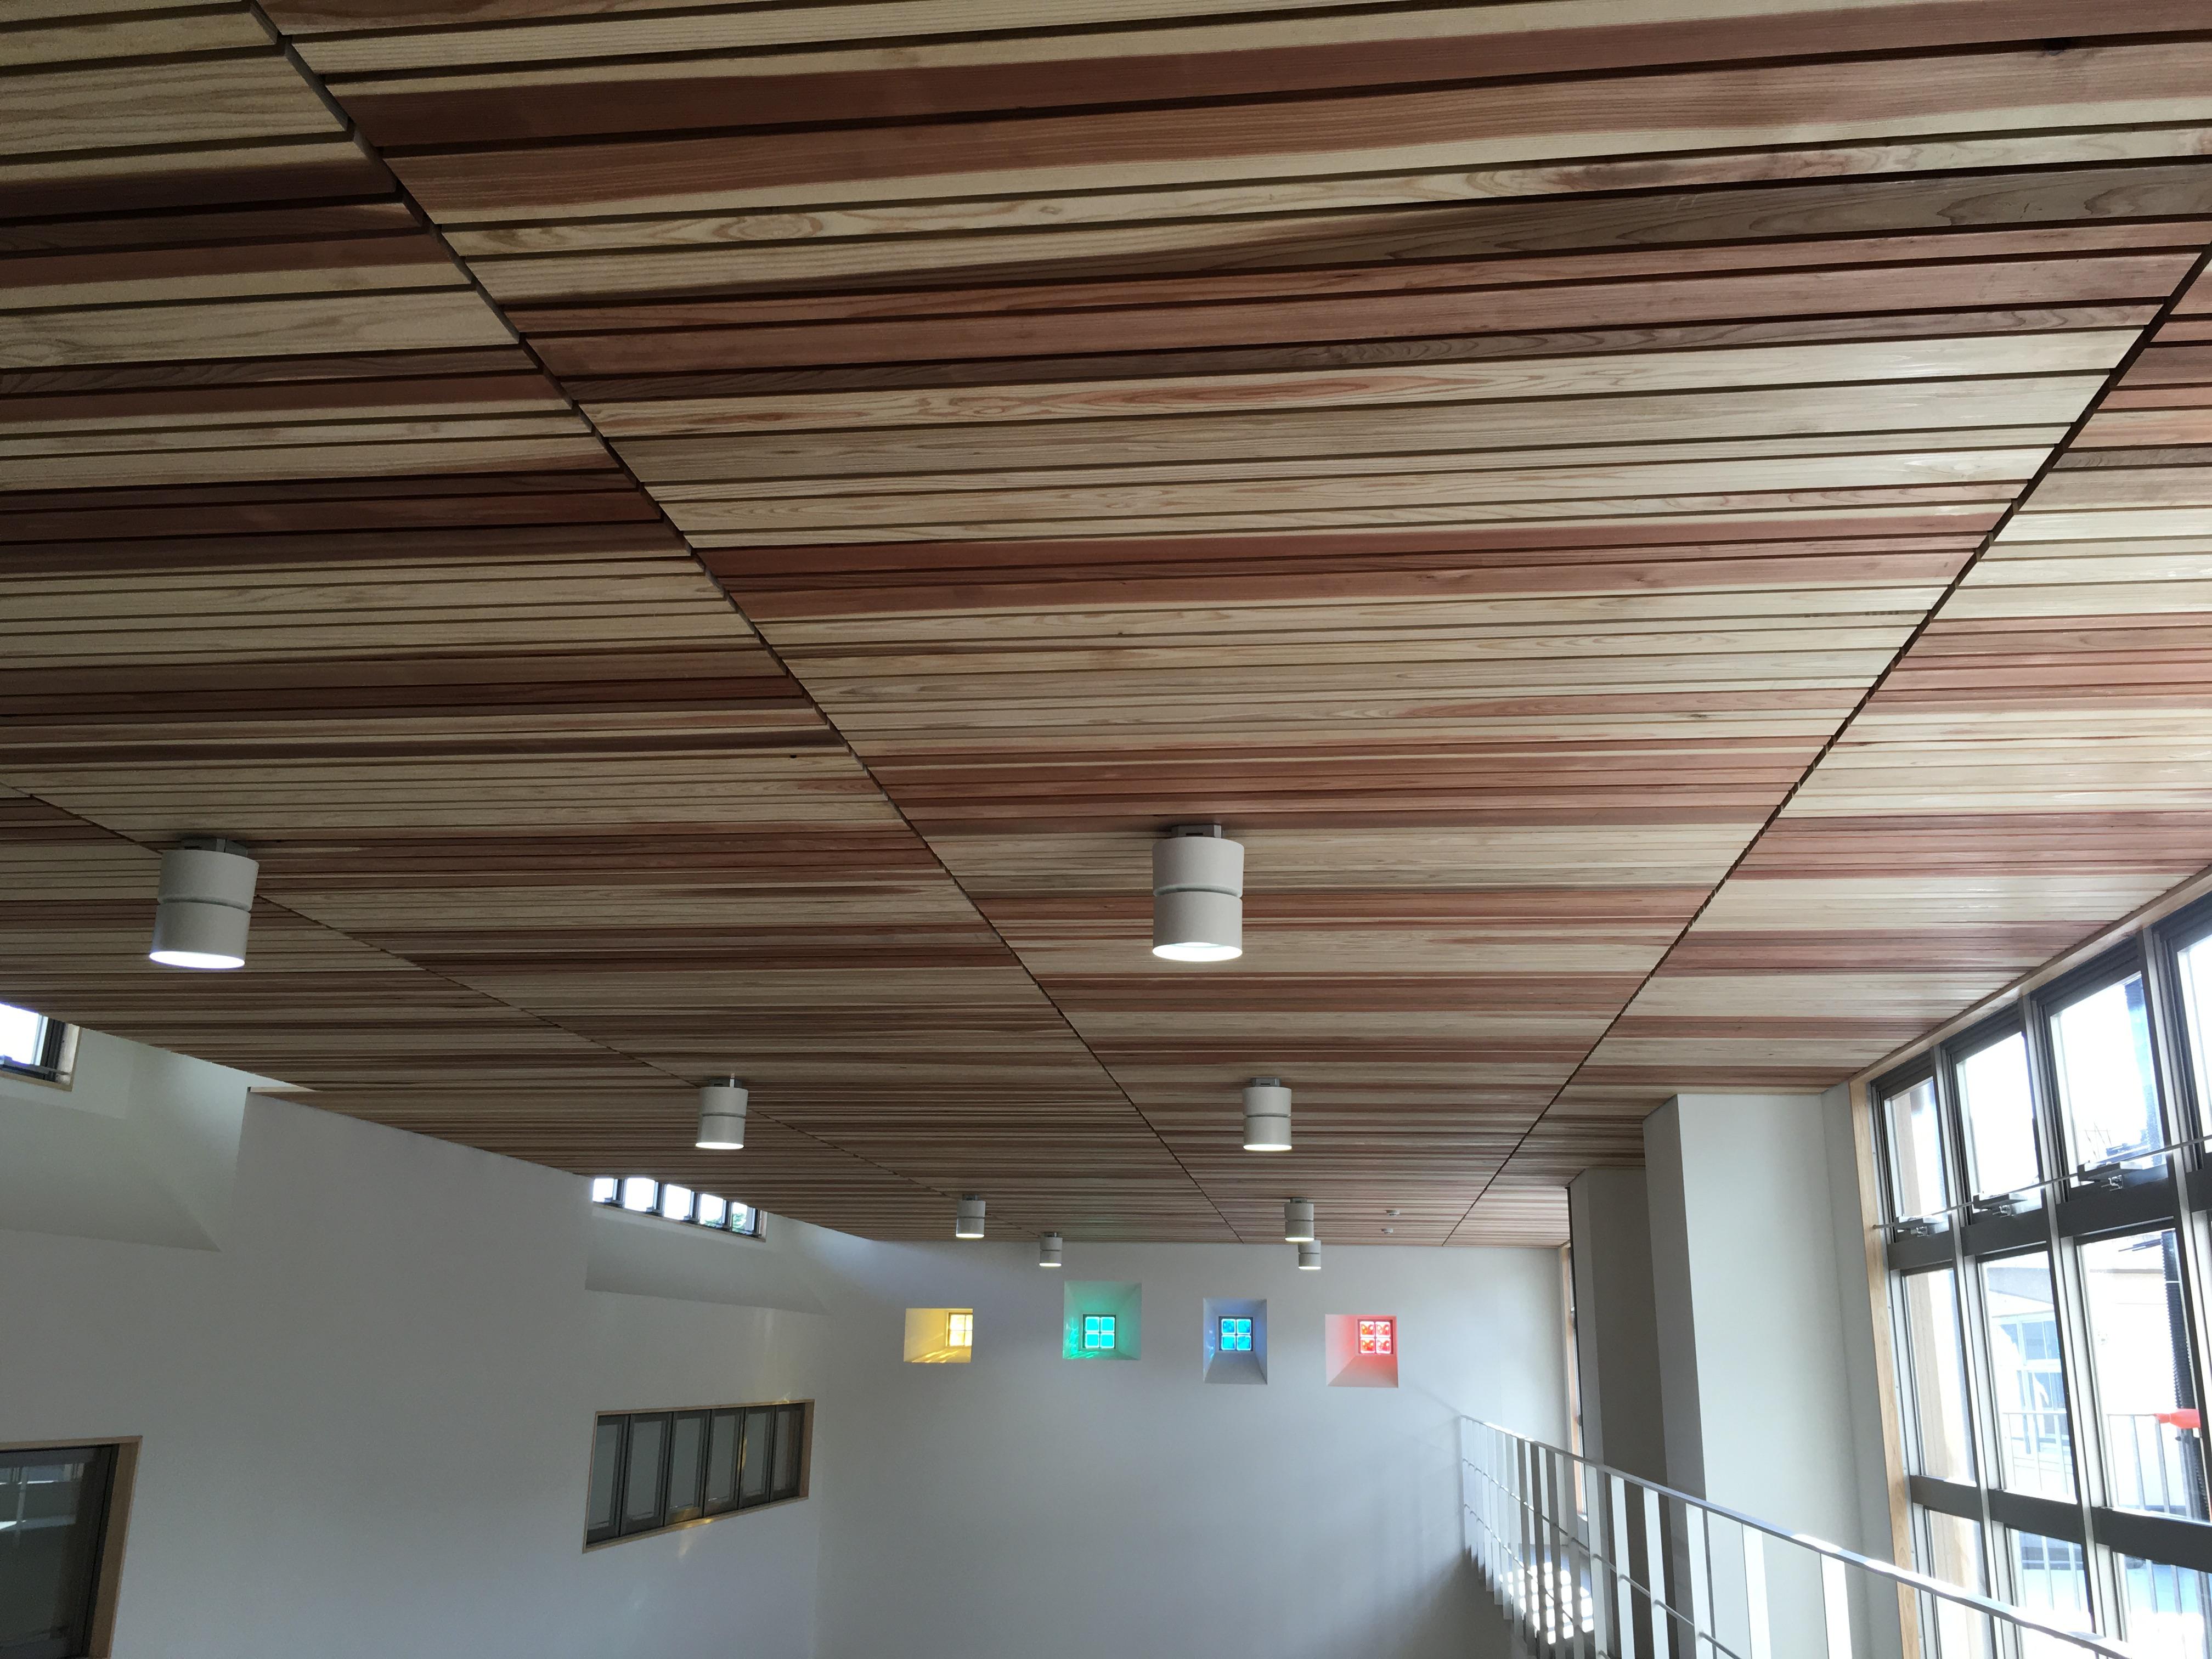 Diyで和室の天井張り替えに挑戦 基礎知識 作業の手順を解説 Diyer